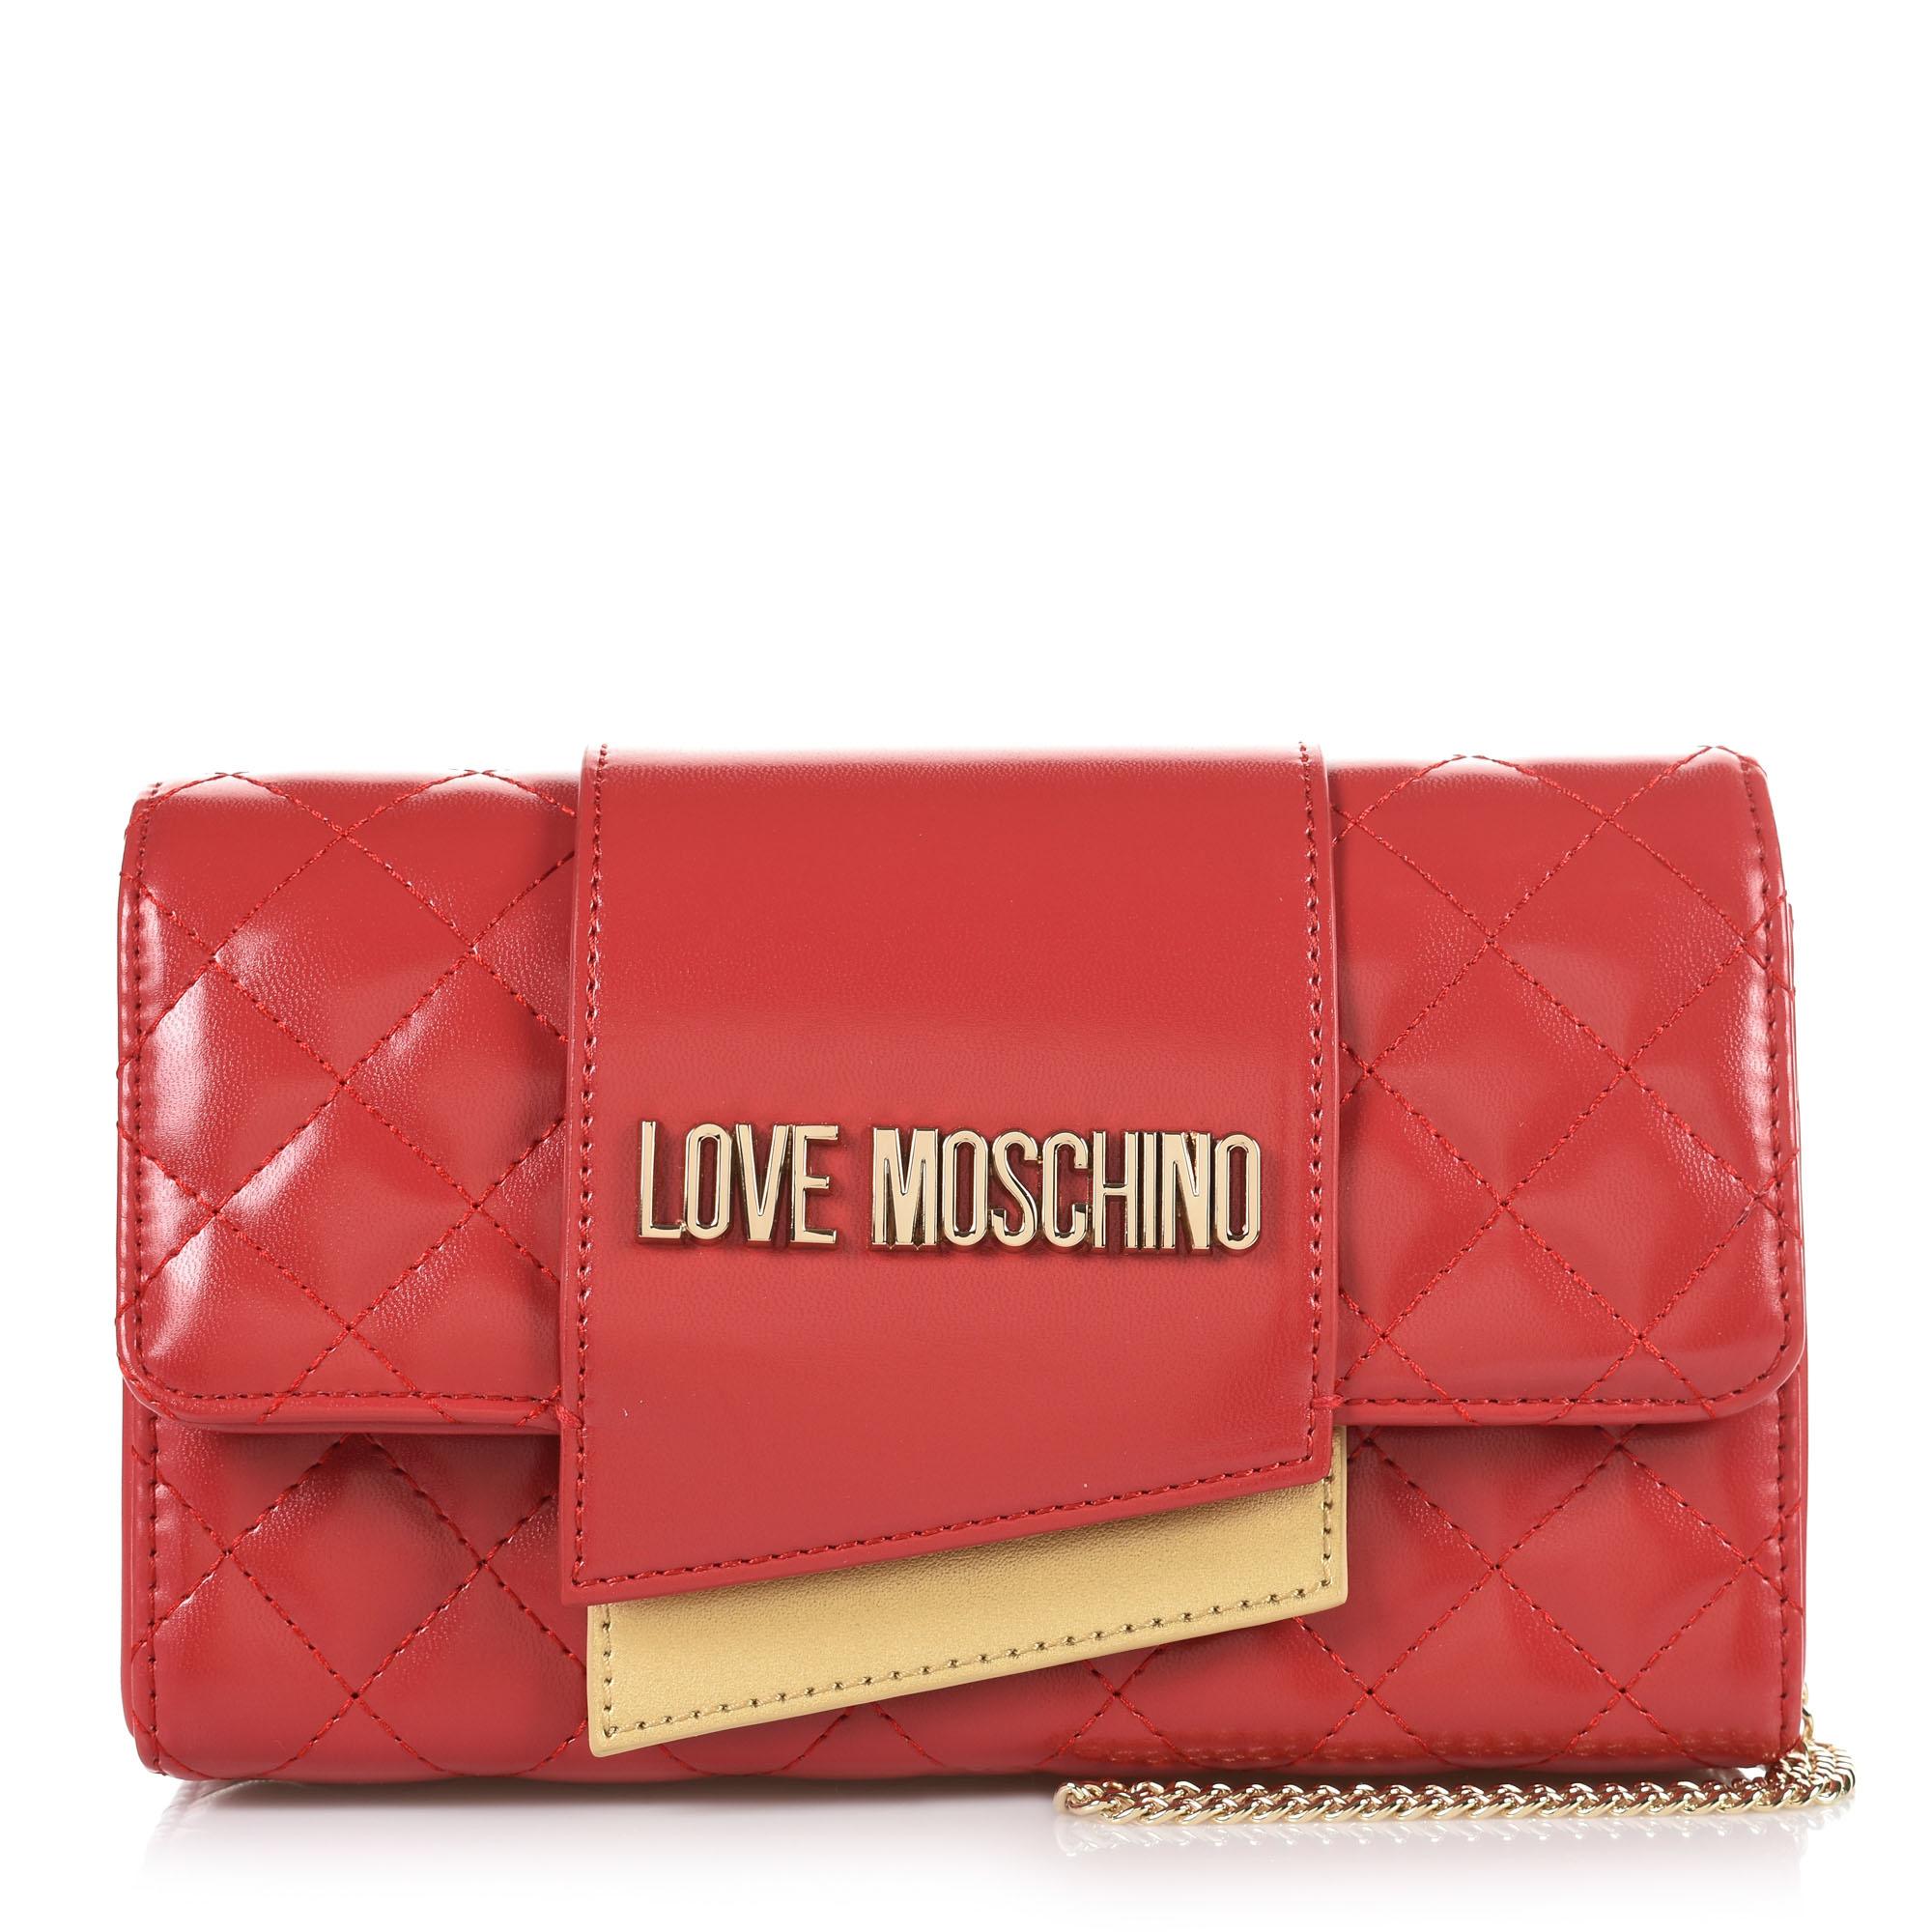 b2dea77adb Τσαντάκι Ώμου-Χιαστί Love Moschino Borsa Quilted Nappa JC4295PP07KA